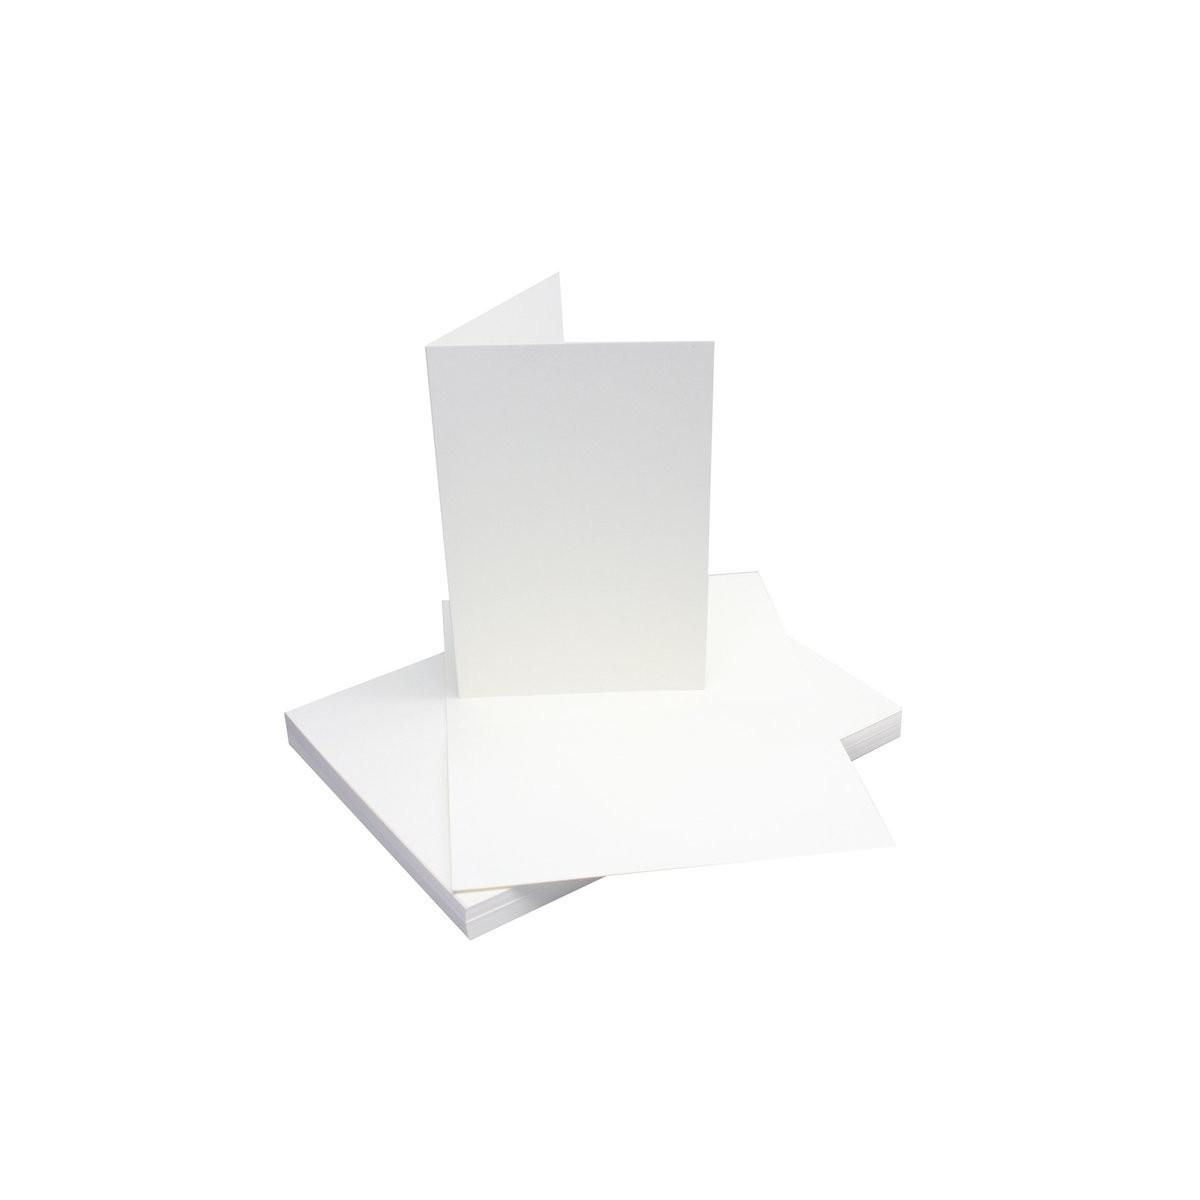 50 Doppelkarten Karten Klappkarten Faltkarten Din B6 Weiß Karten